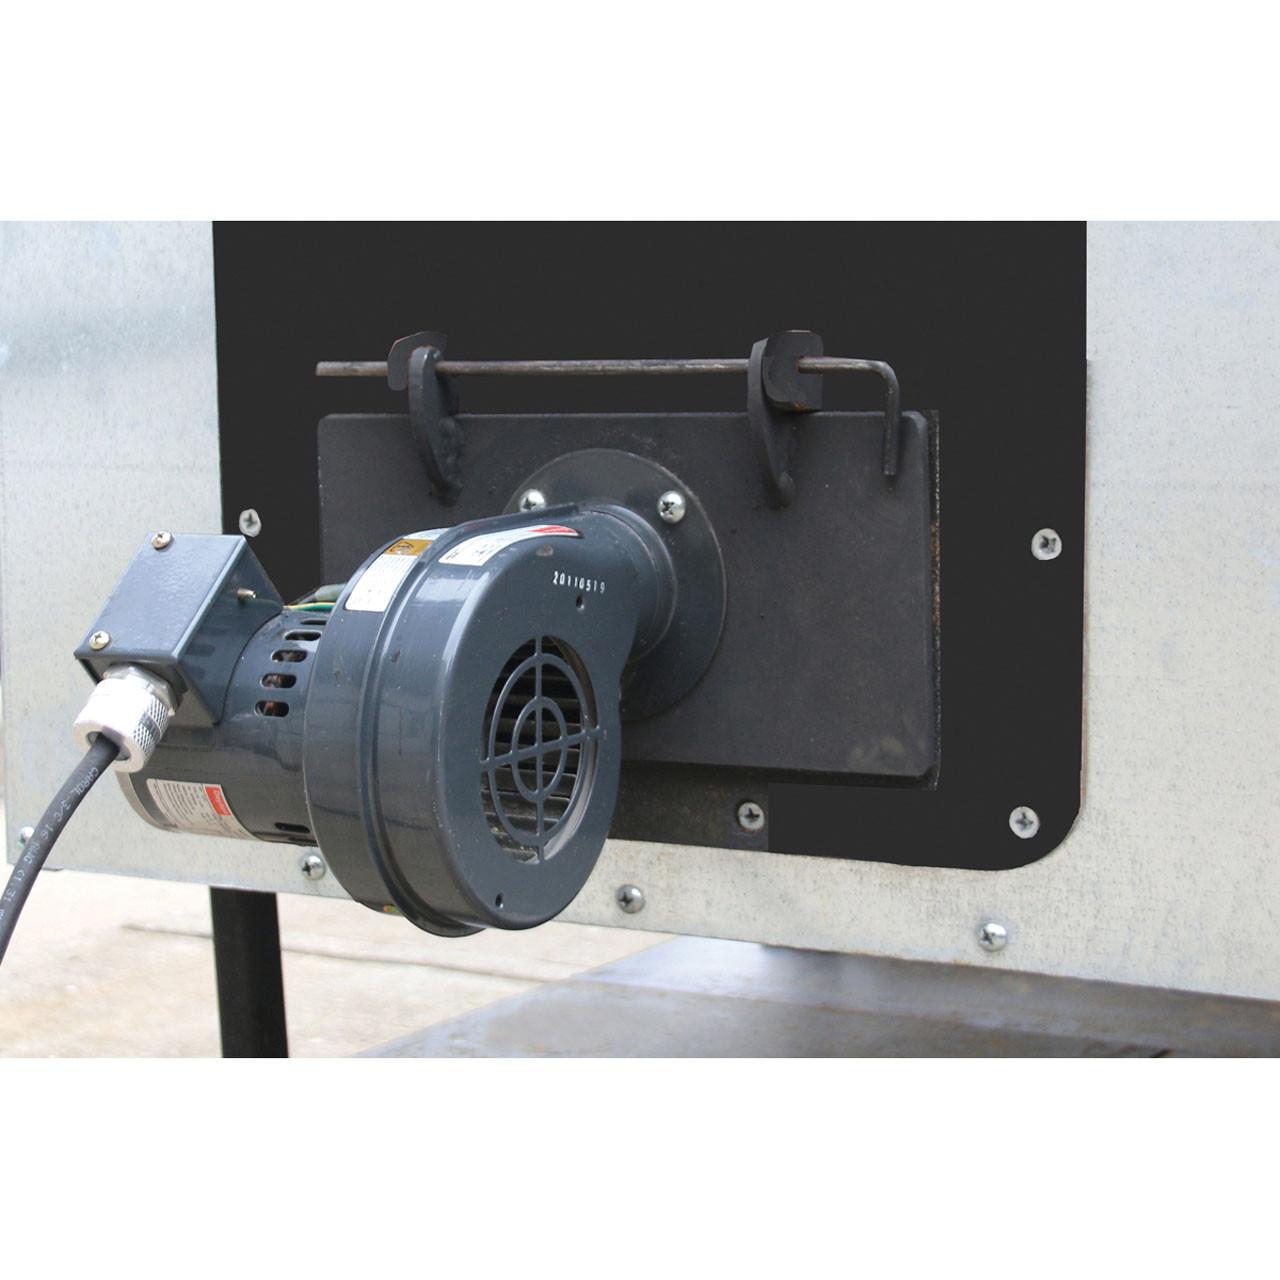 BTU Booster for Half Pint Evaporator